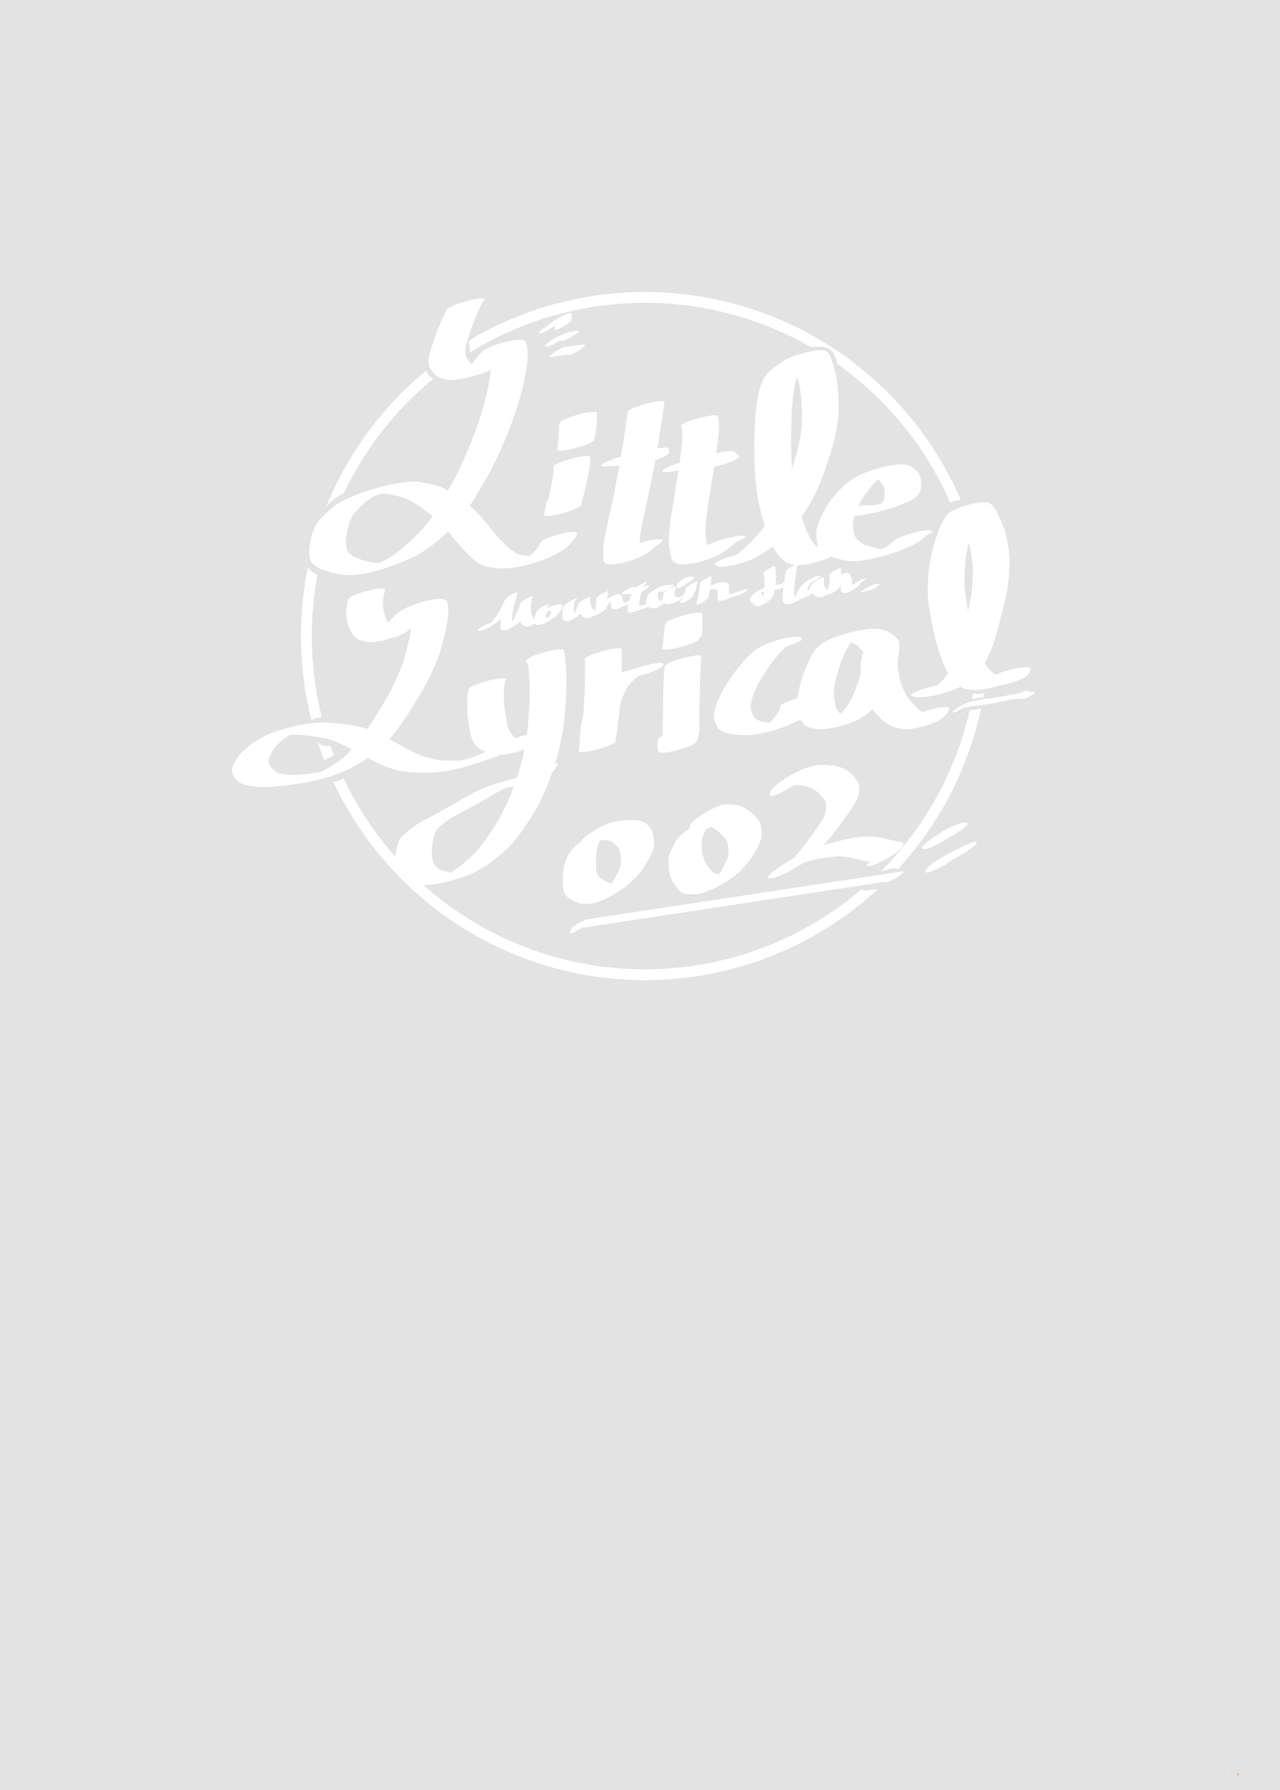 [MountainHan(山含)] Little Lyrical 002 (Princess Connect! Re:Dive) [Chinese] [切嚕系女子個人搬運] [Decensored] +小宣傳 3